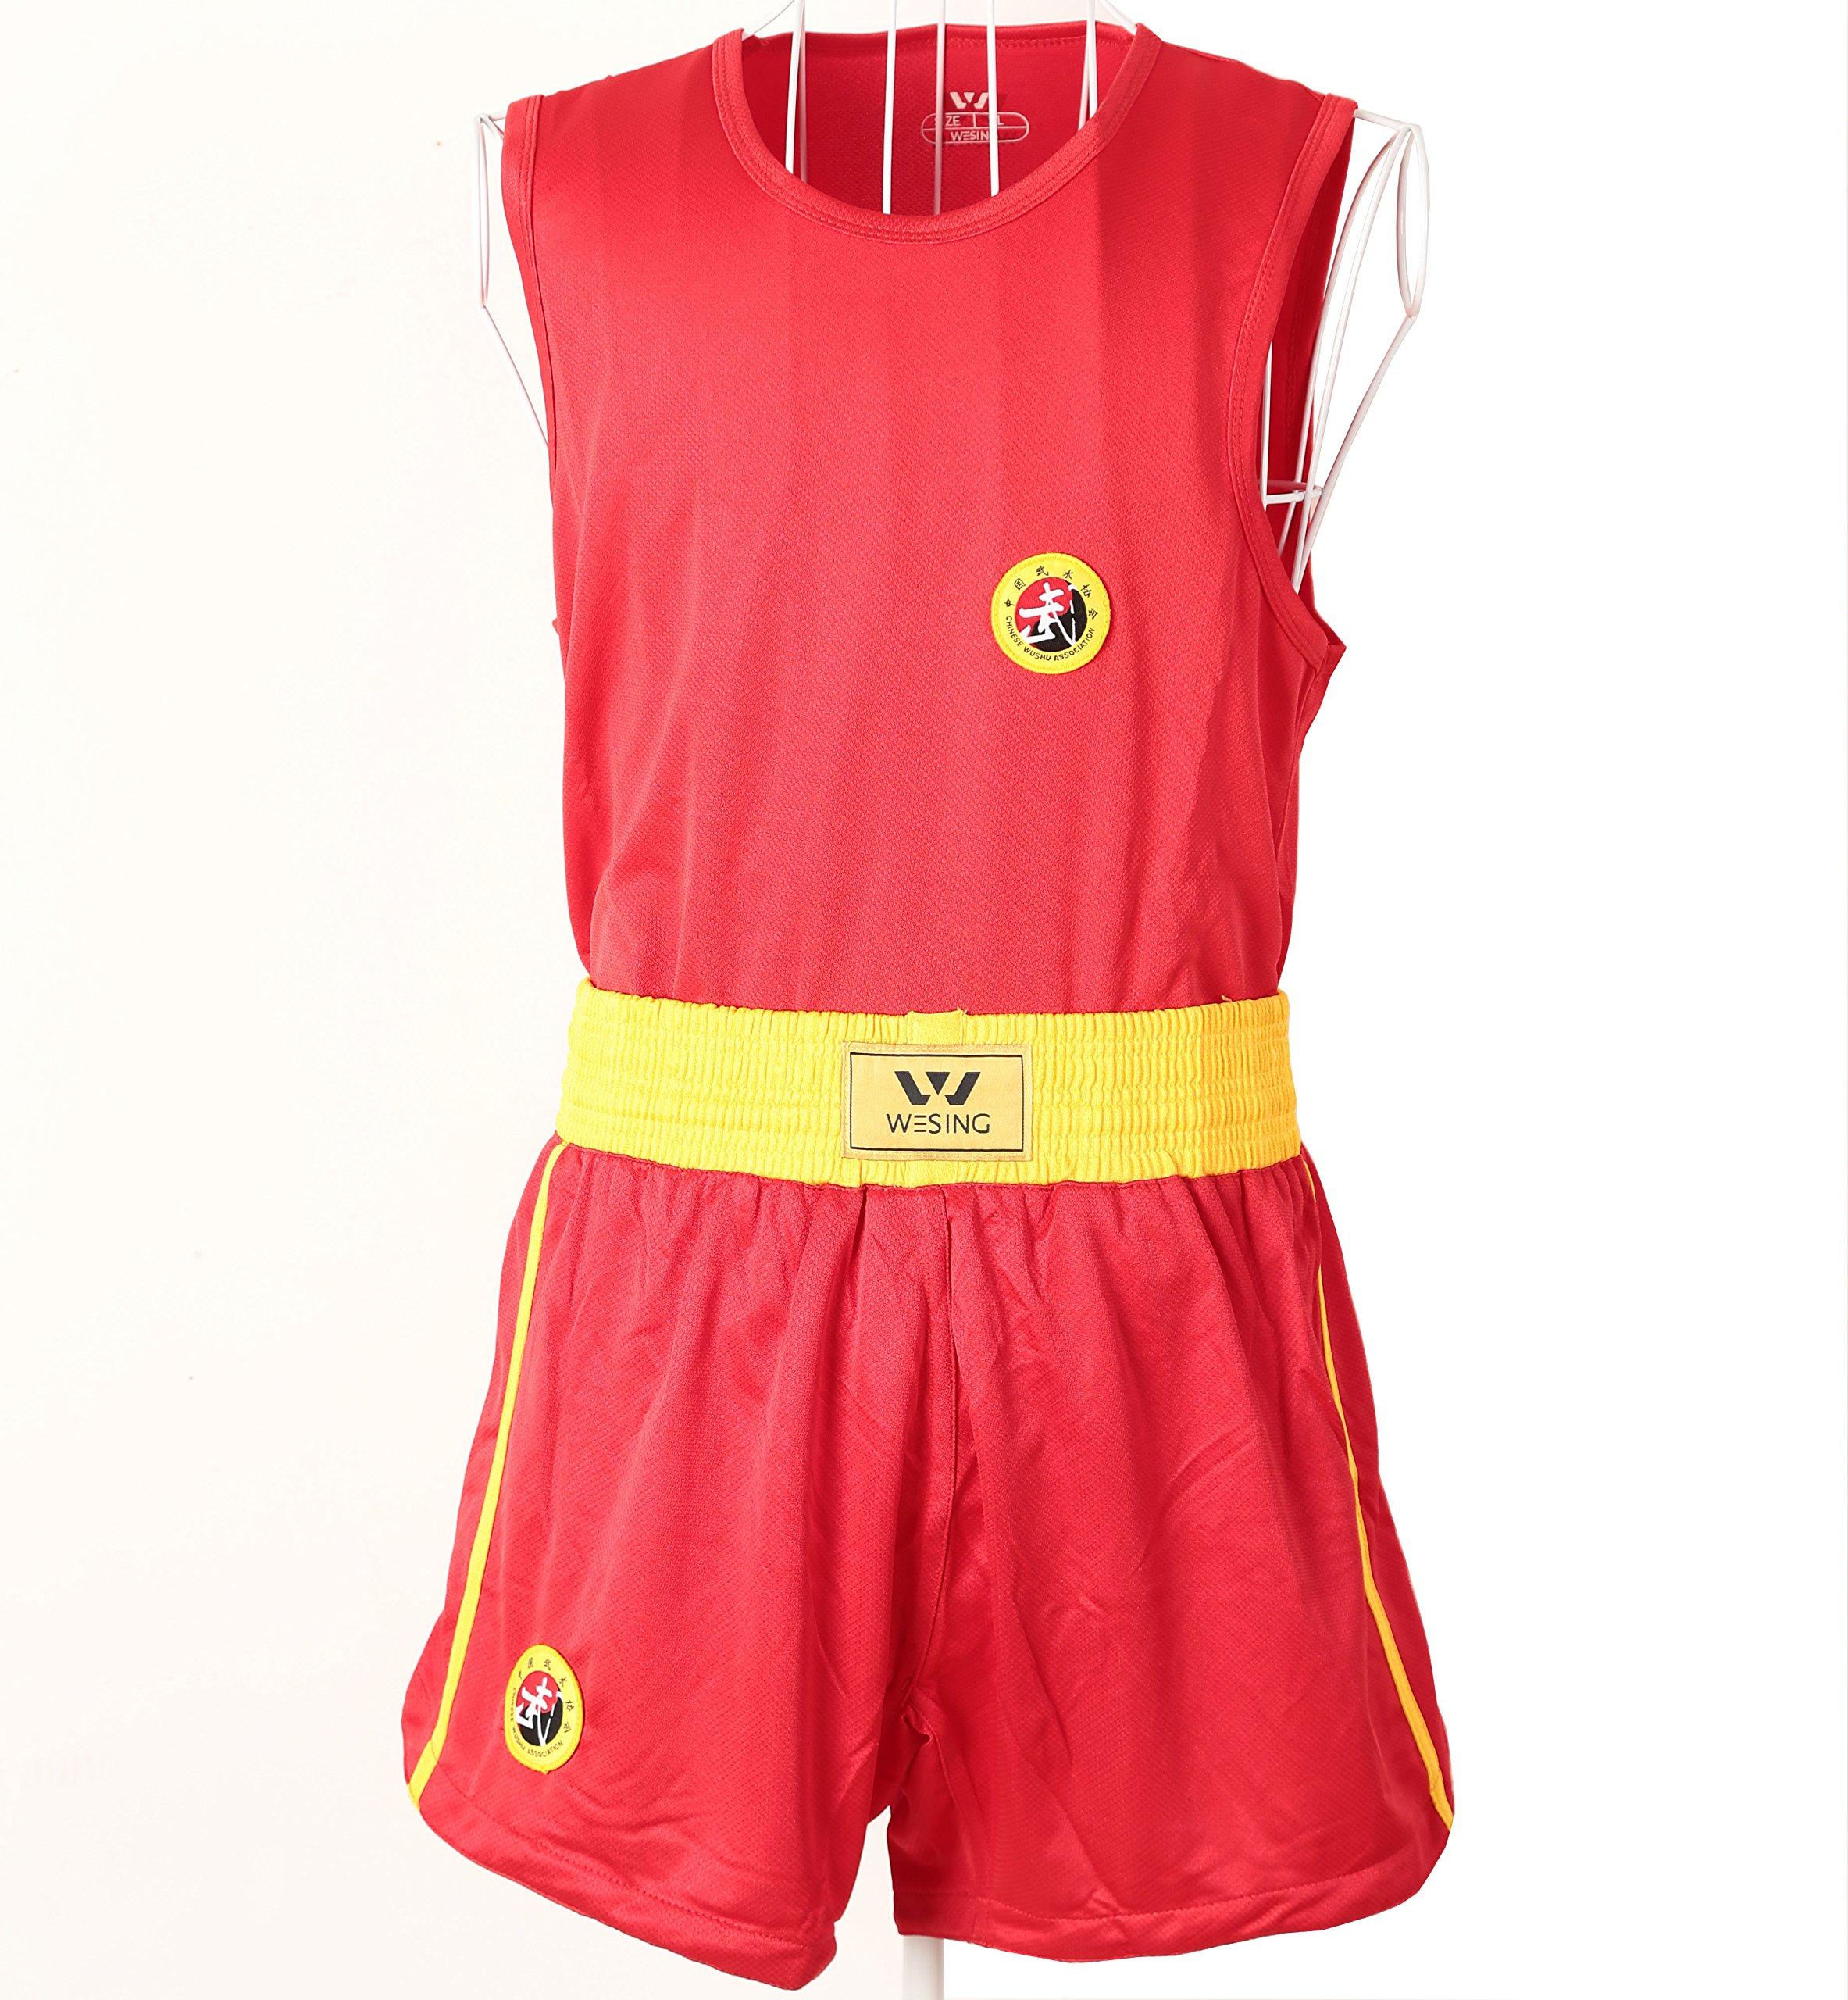 wesing Wushu Sanda Uniform Kick Boxing Sanda Suit